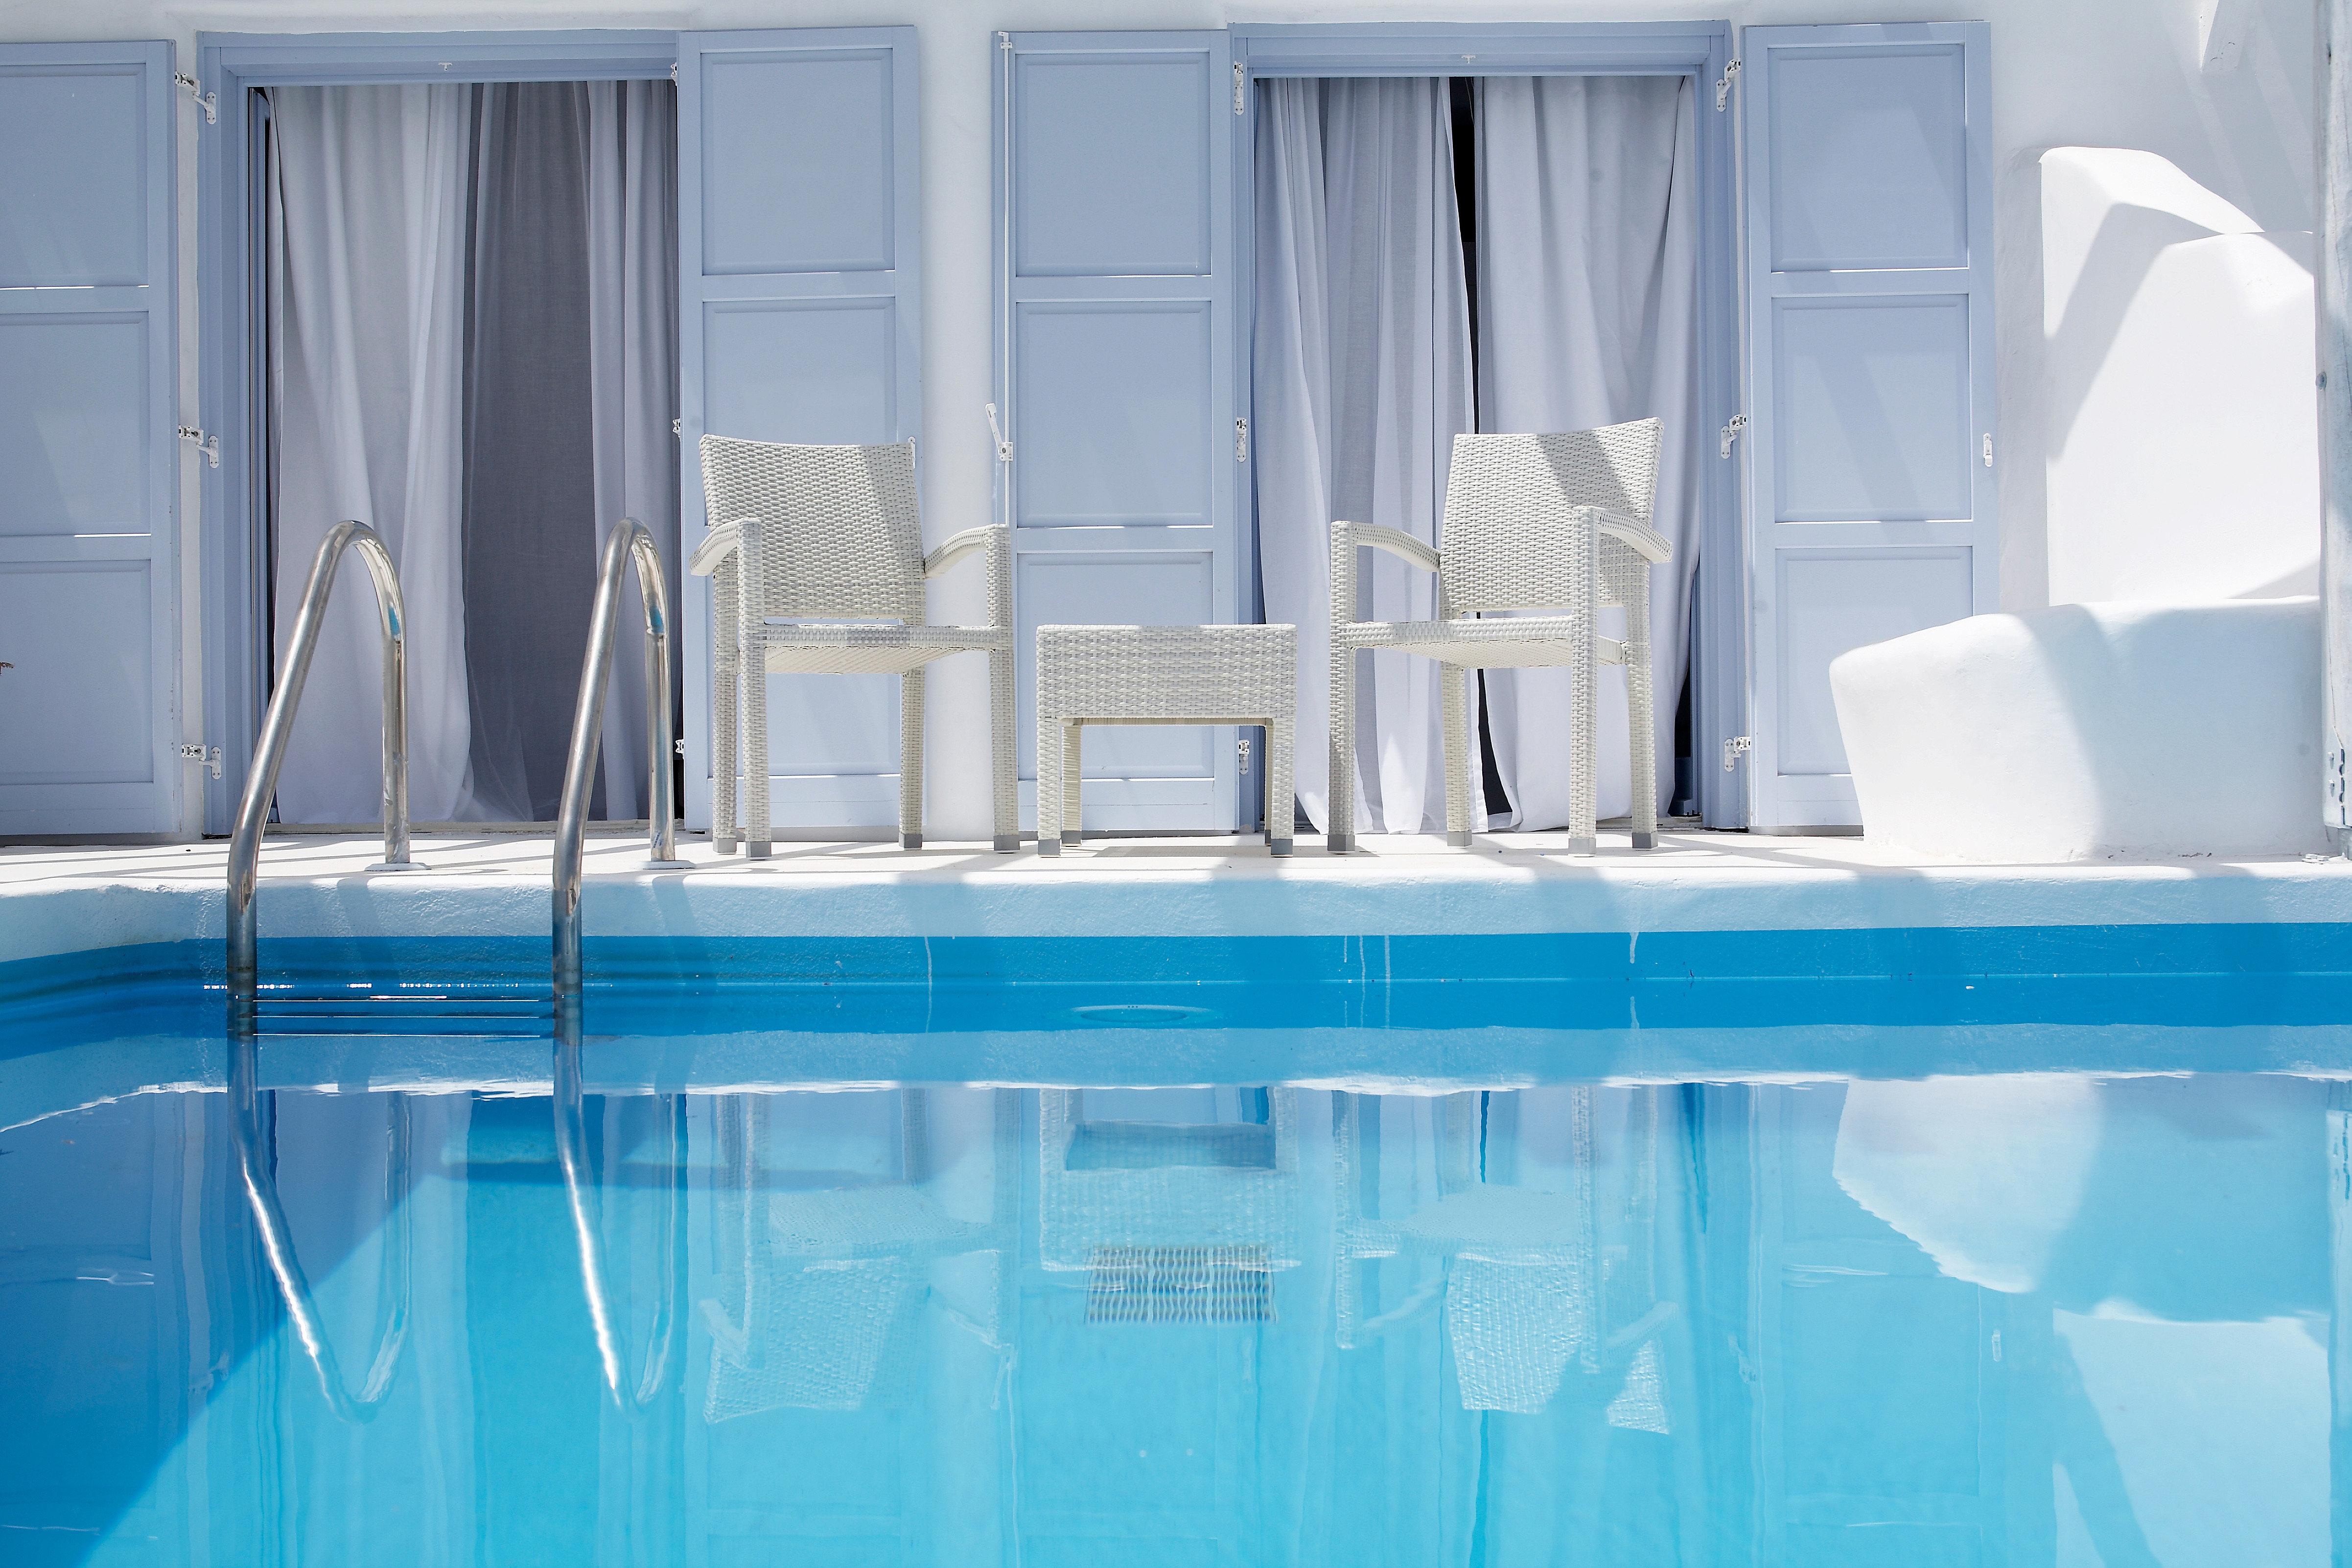 Boutique Deck Luxury Pool Scenic views swimming pool blue plumbing fixture bathtub